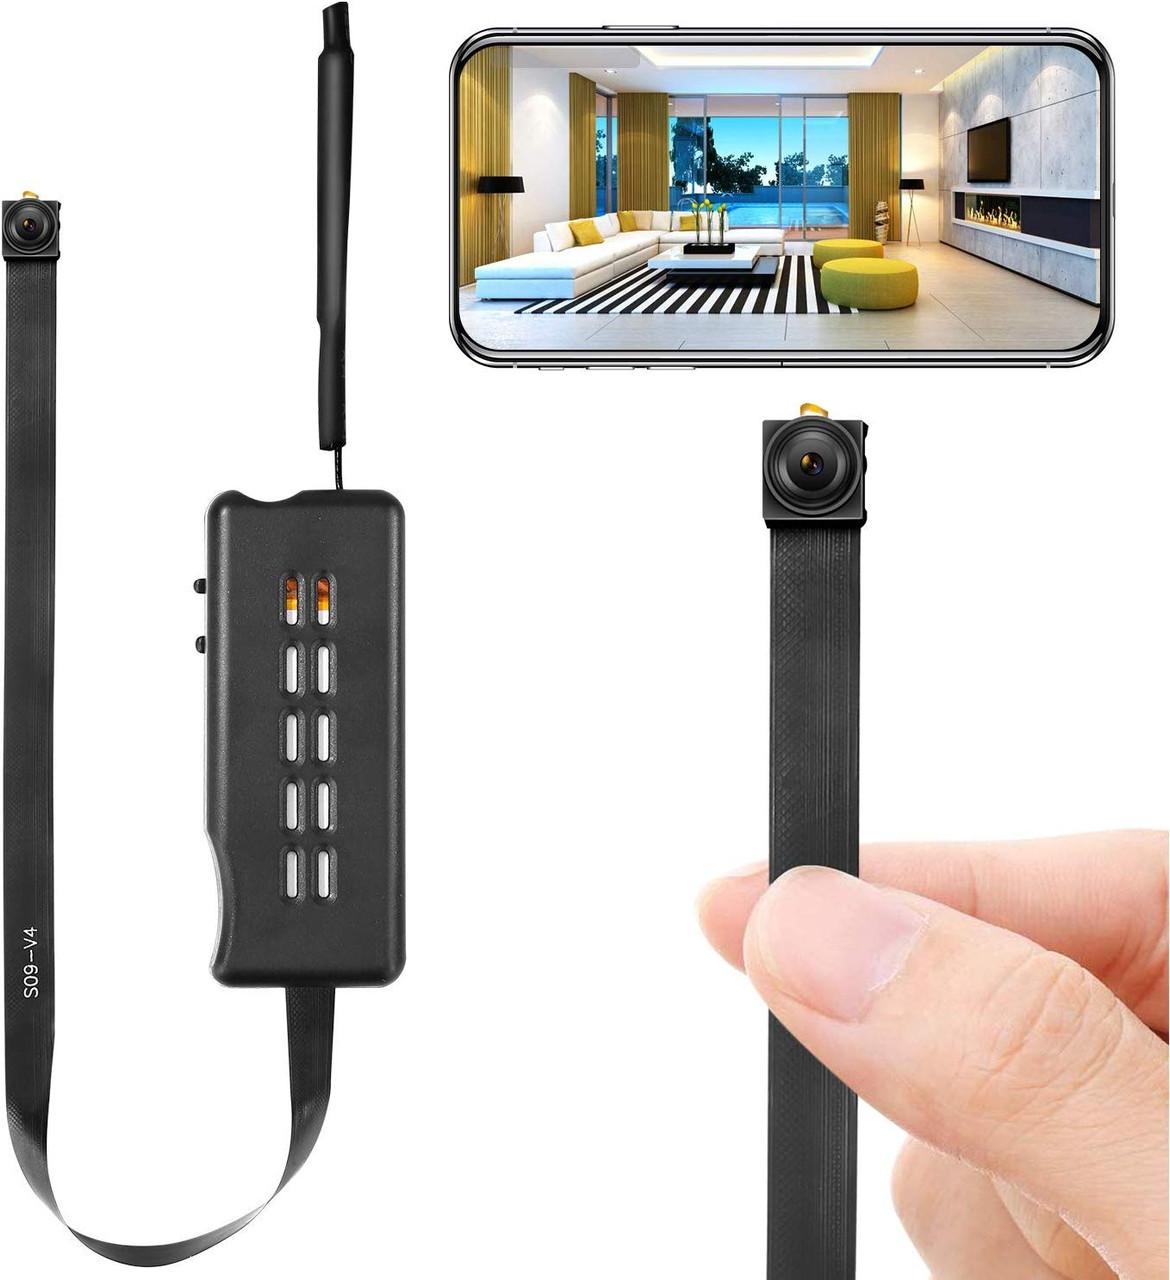 WiFi Mini IP Camera 1080P Wireless Network Monitor Home Security Nanny Cam